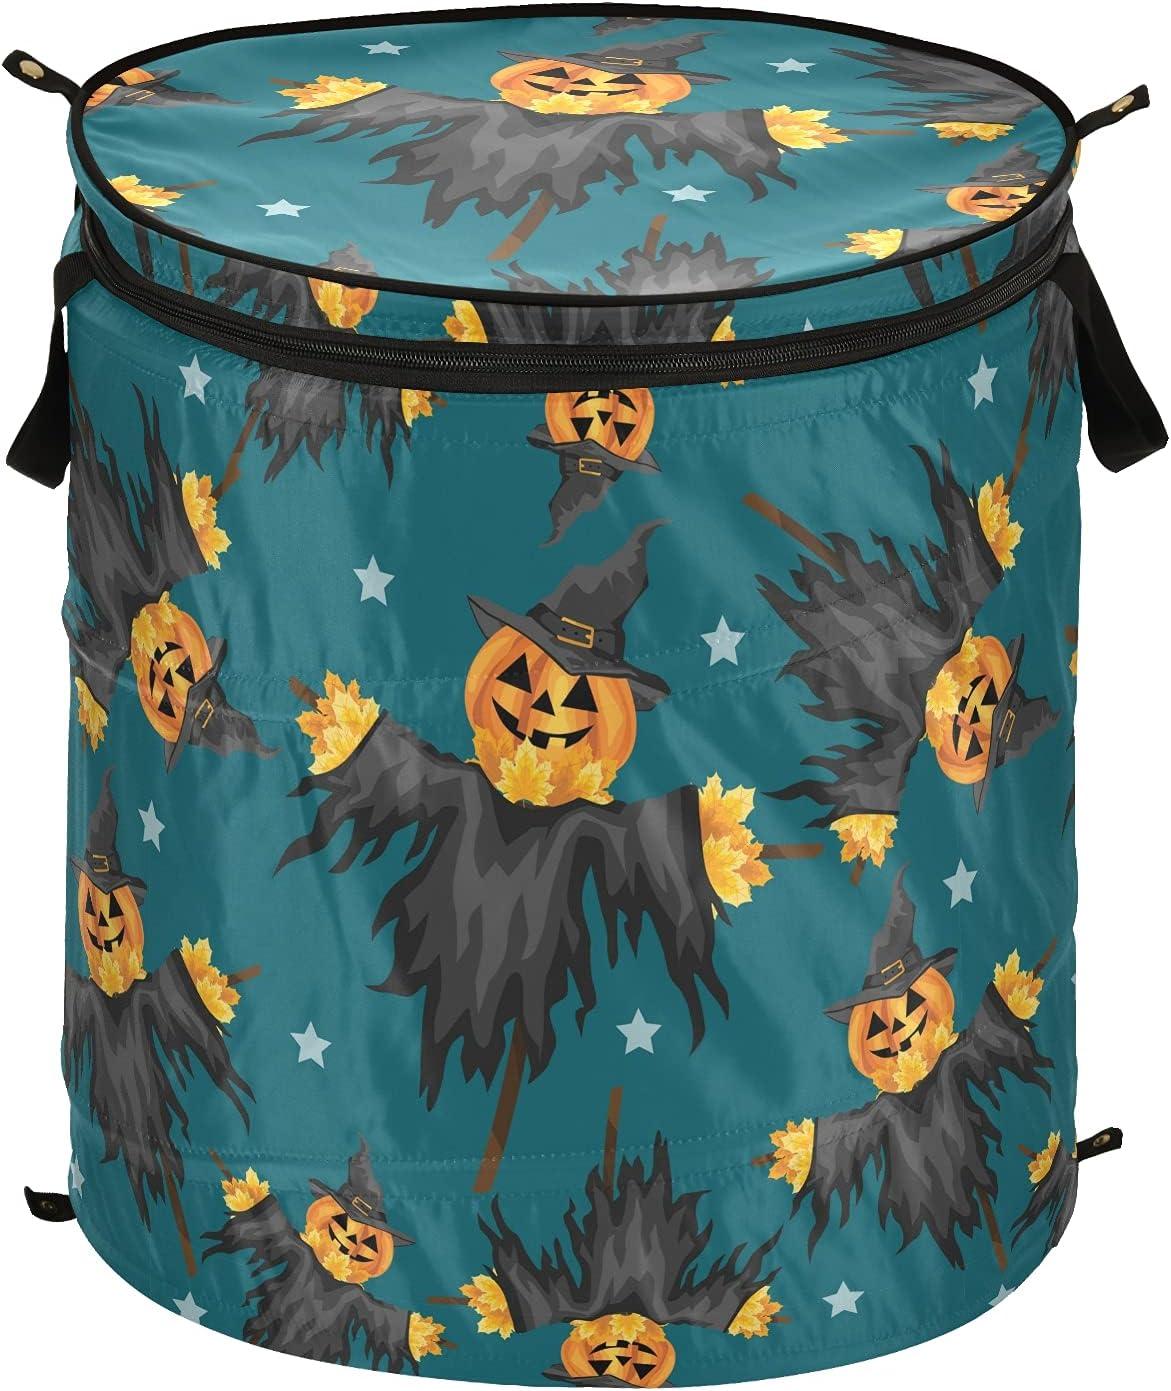 Halloween Jack Lantern Arlington Mall Pumpkin Pop Up Lid Fo Max 56% OFF with Hamper Laundry